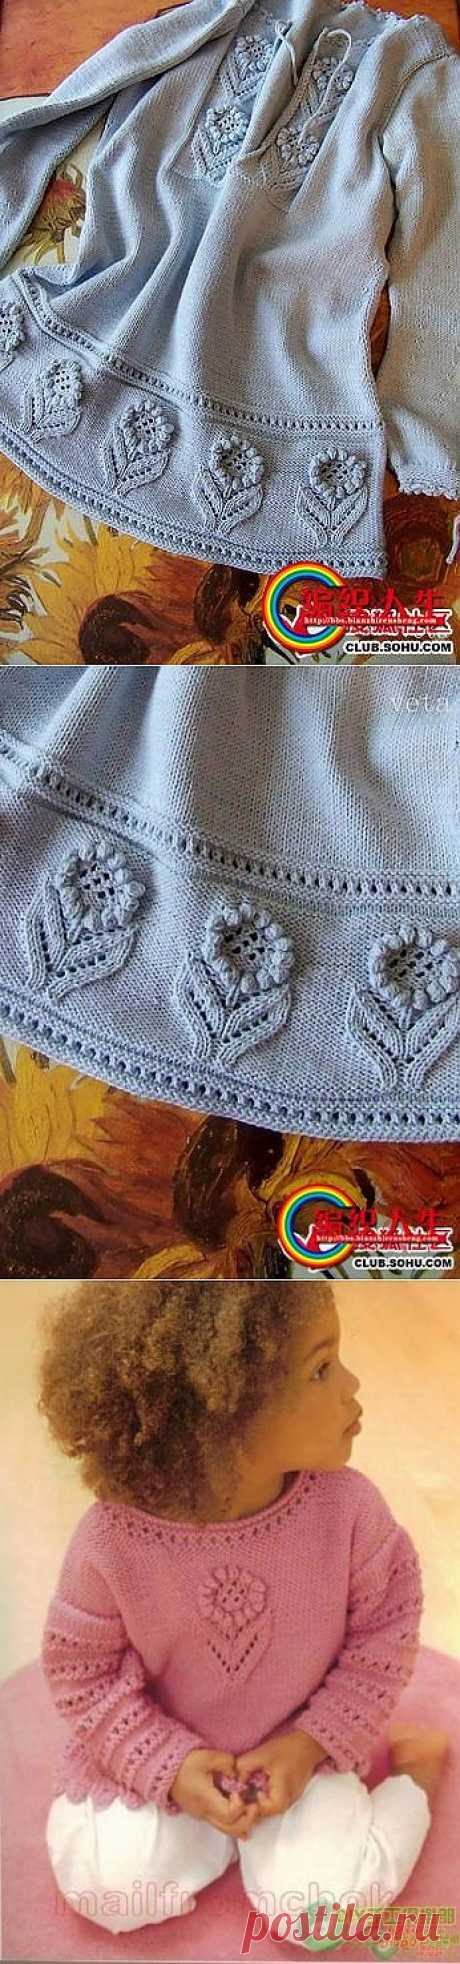 цитата Angela32 : Вязание спицы. Джемпер с отделкой. (18:37 18-02-2014) [3960810/313770774] - latina_nad@mail.ru - Почта Mail.Ru